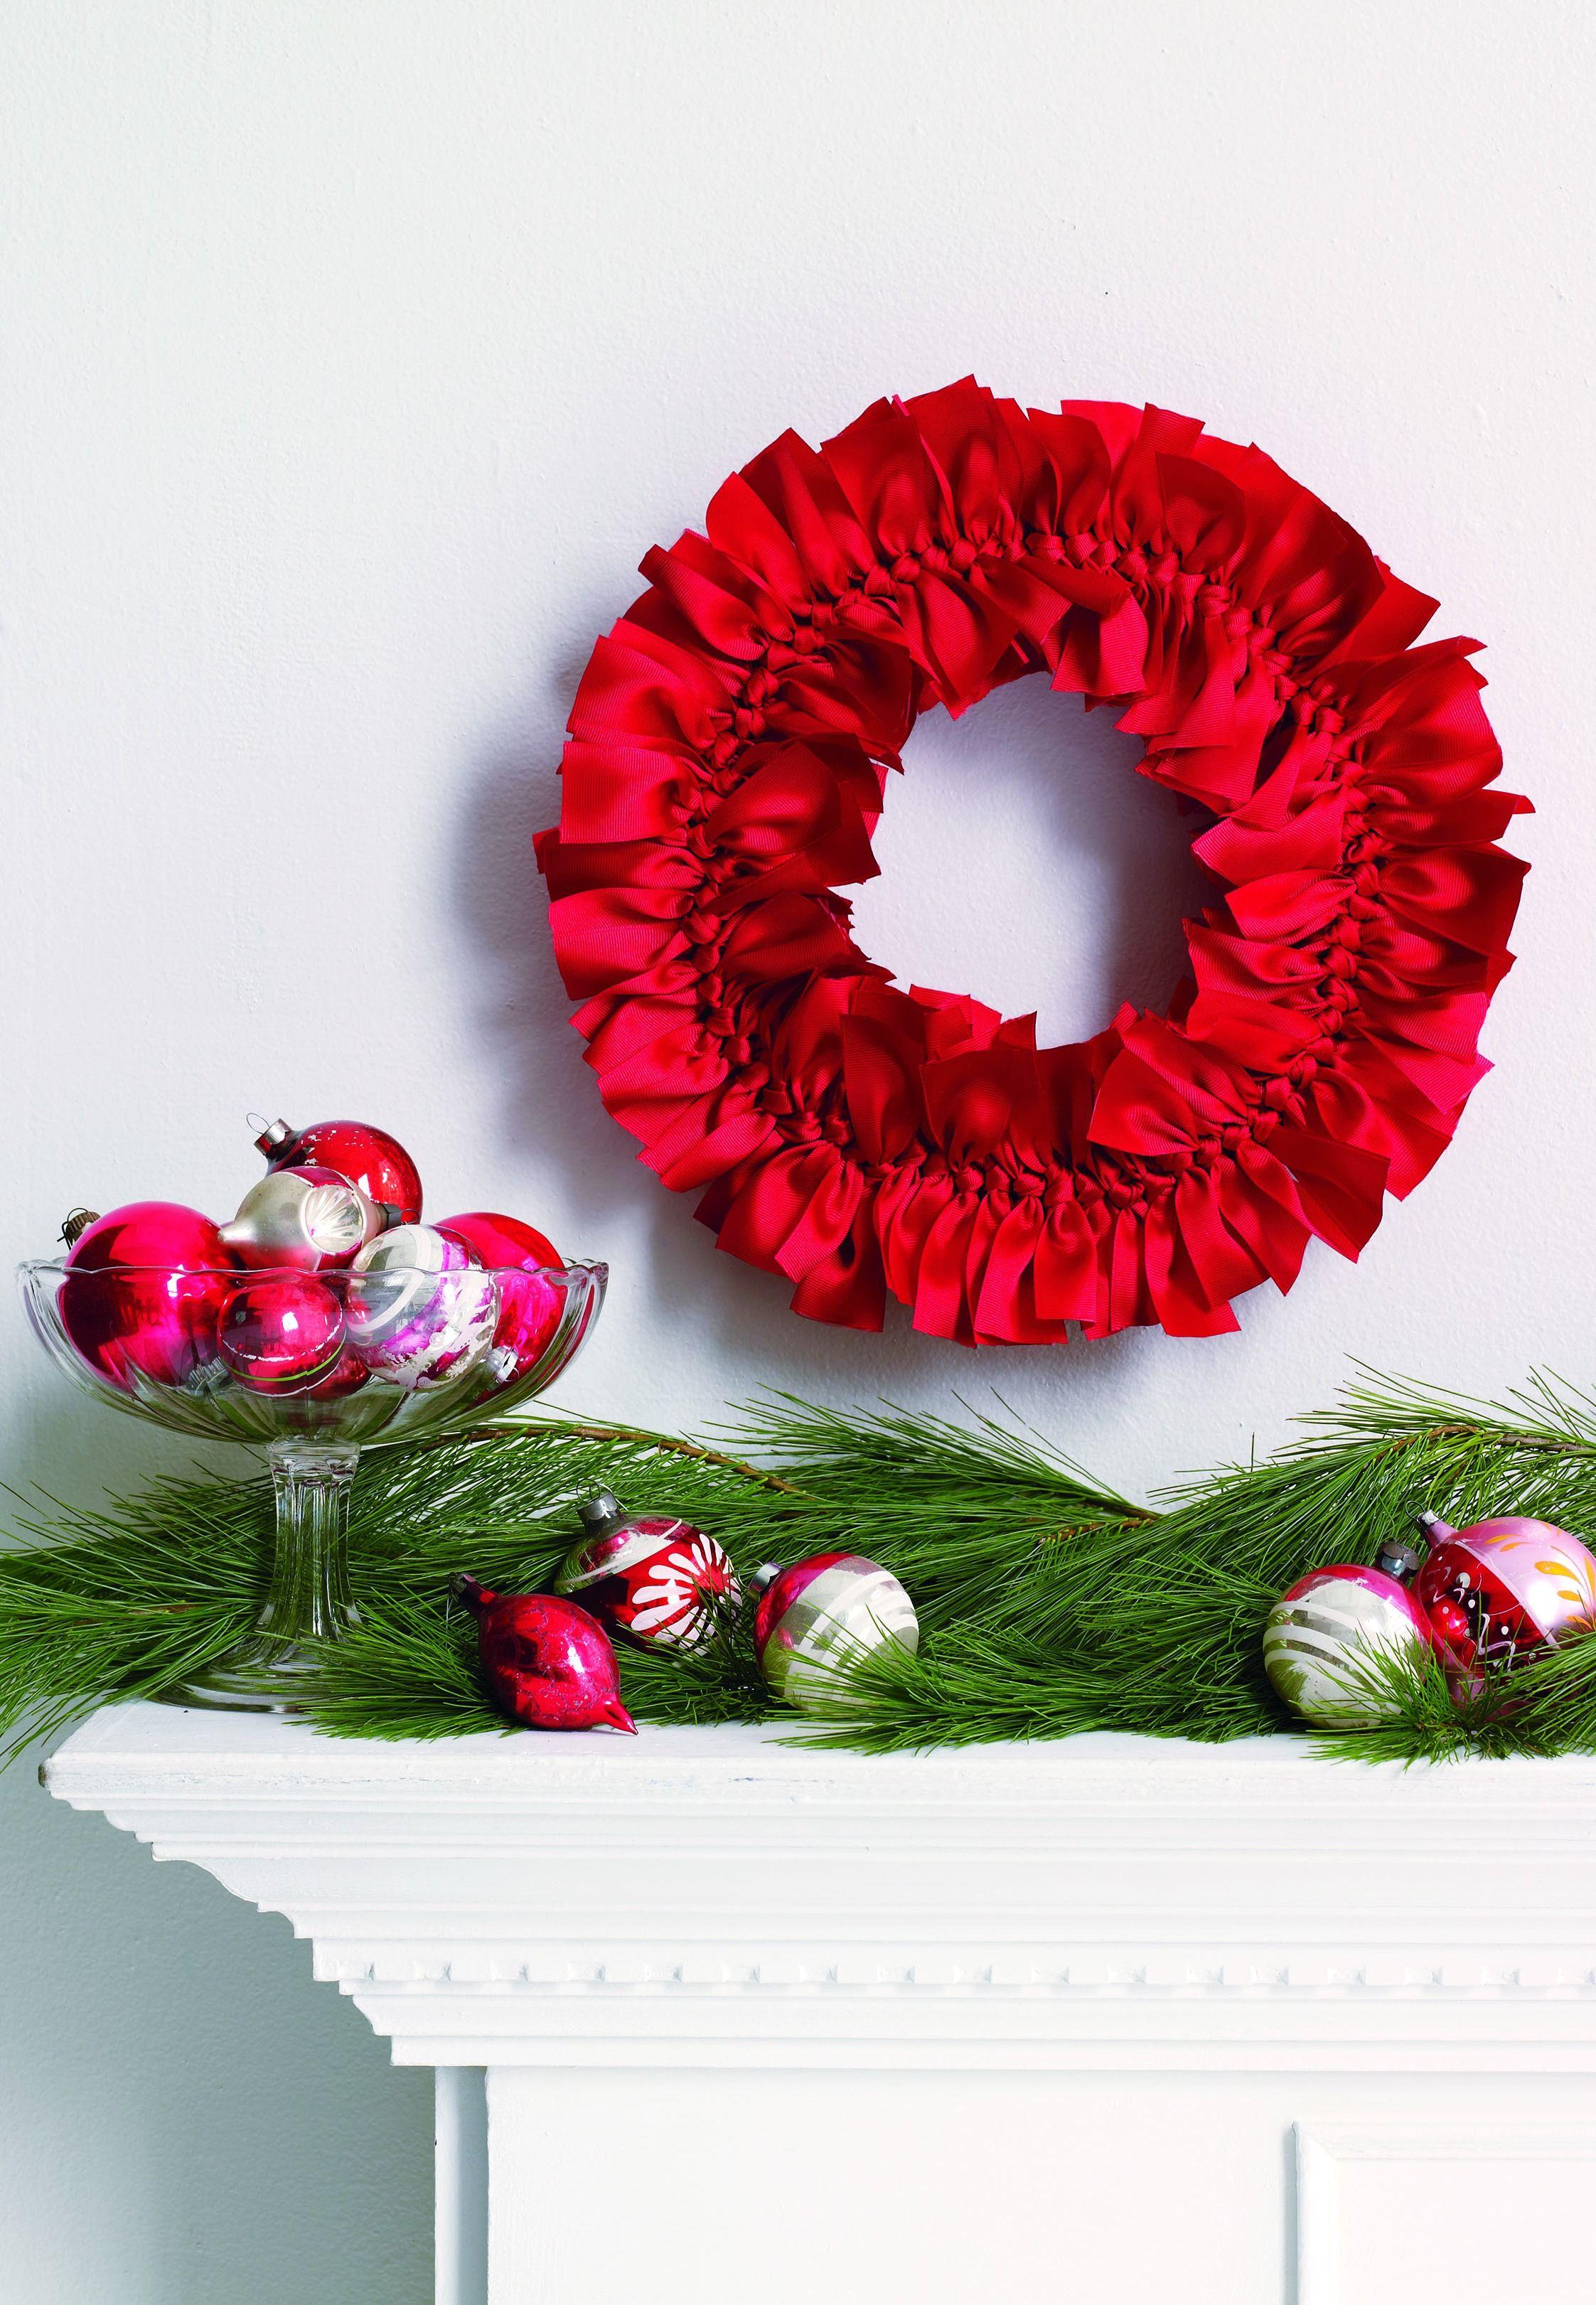 diy christmas wreath ideas  how to make a homemade holiday wreath womansdaycom.  diy christmas wreath ideas  how to make a homemade holiday